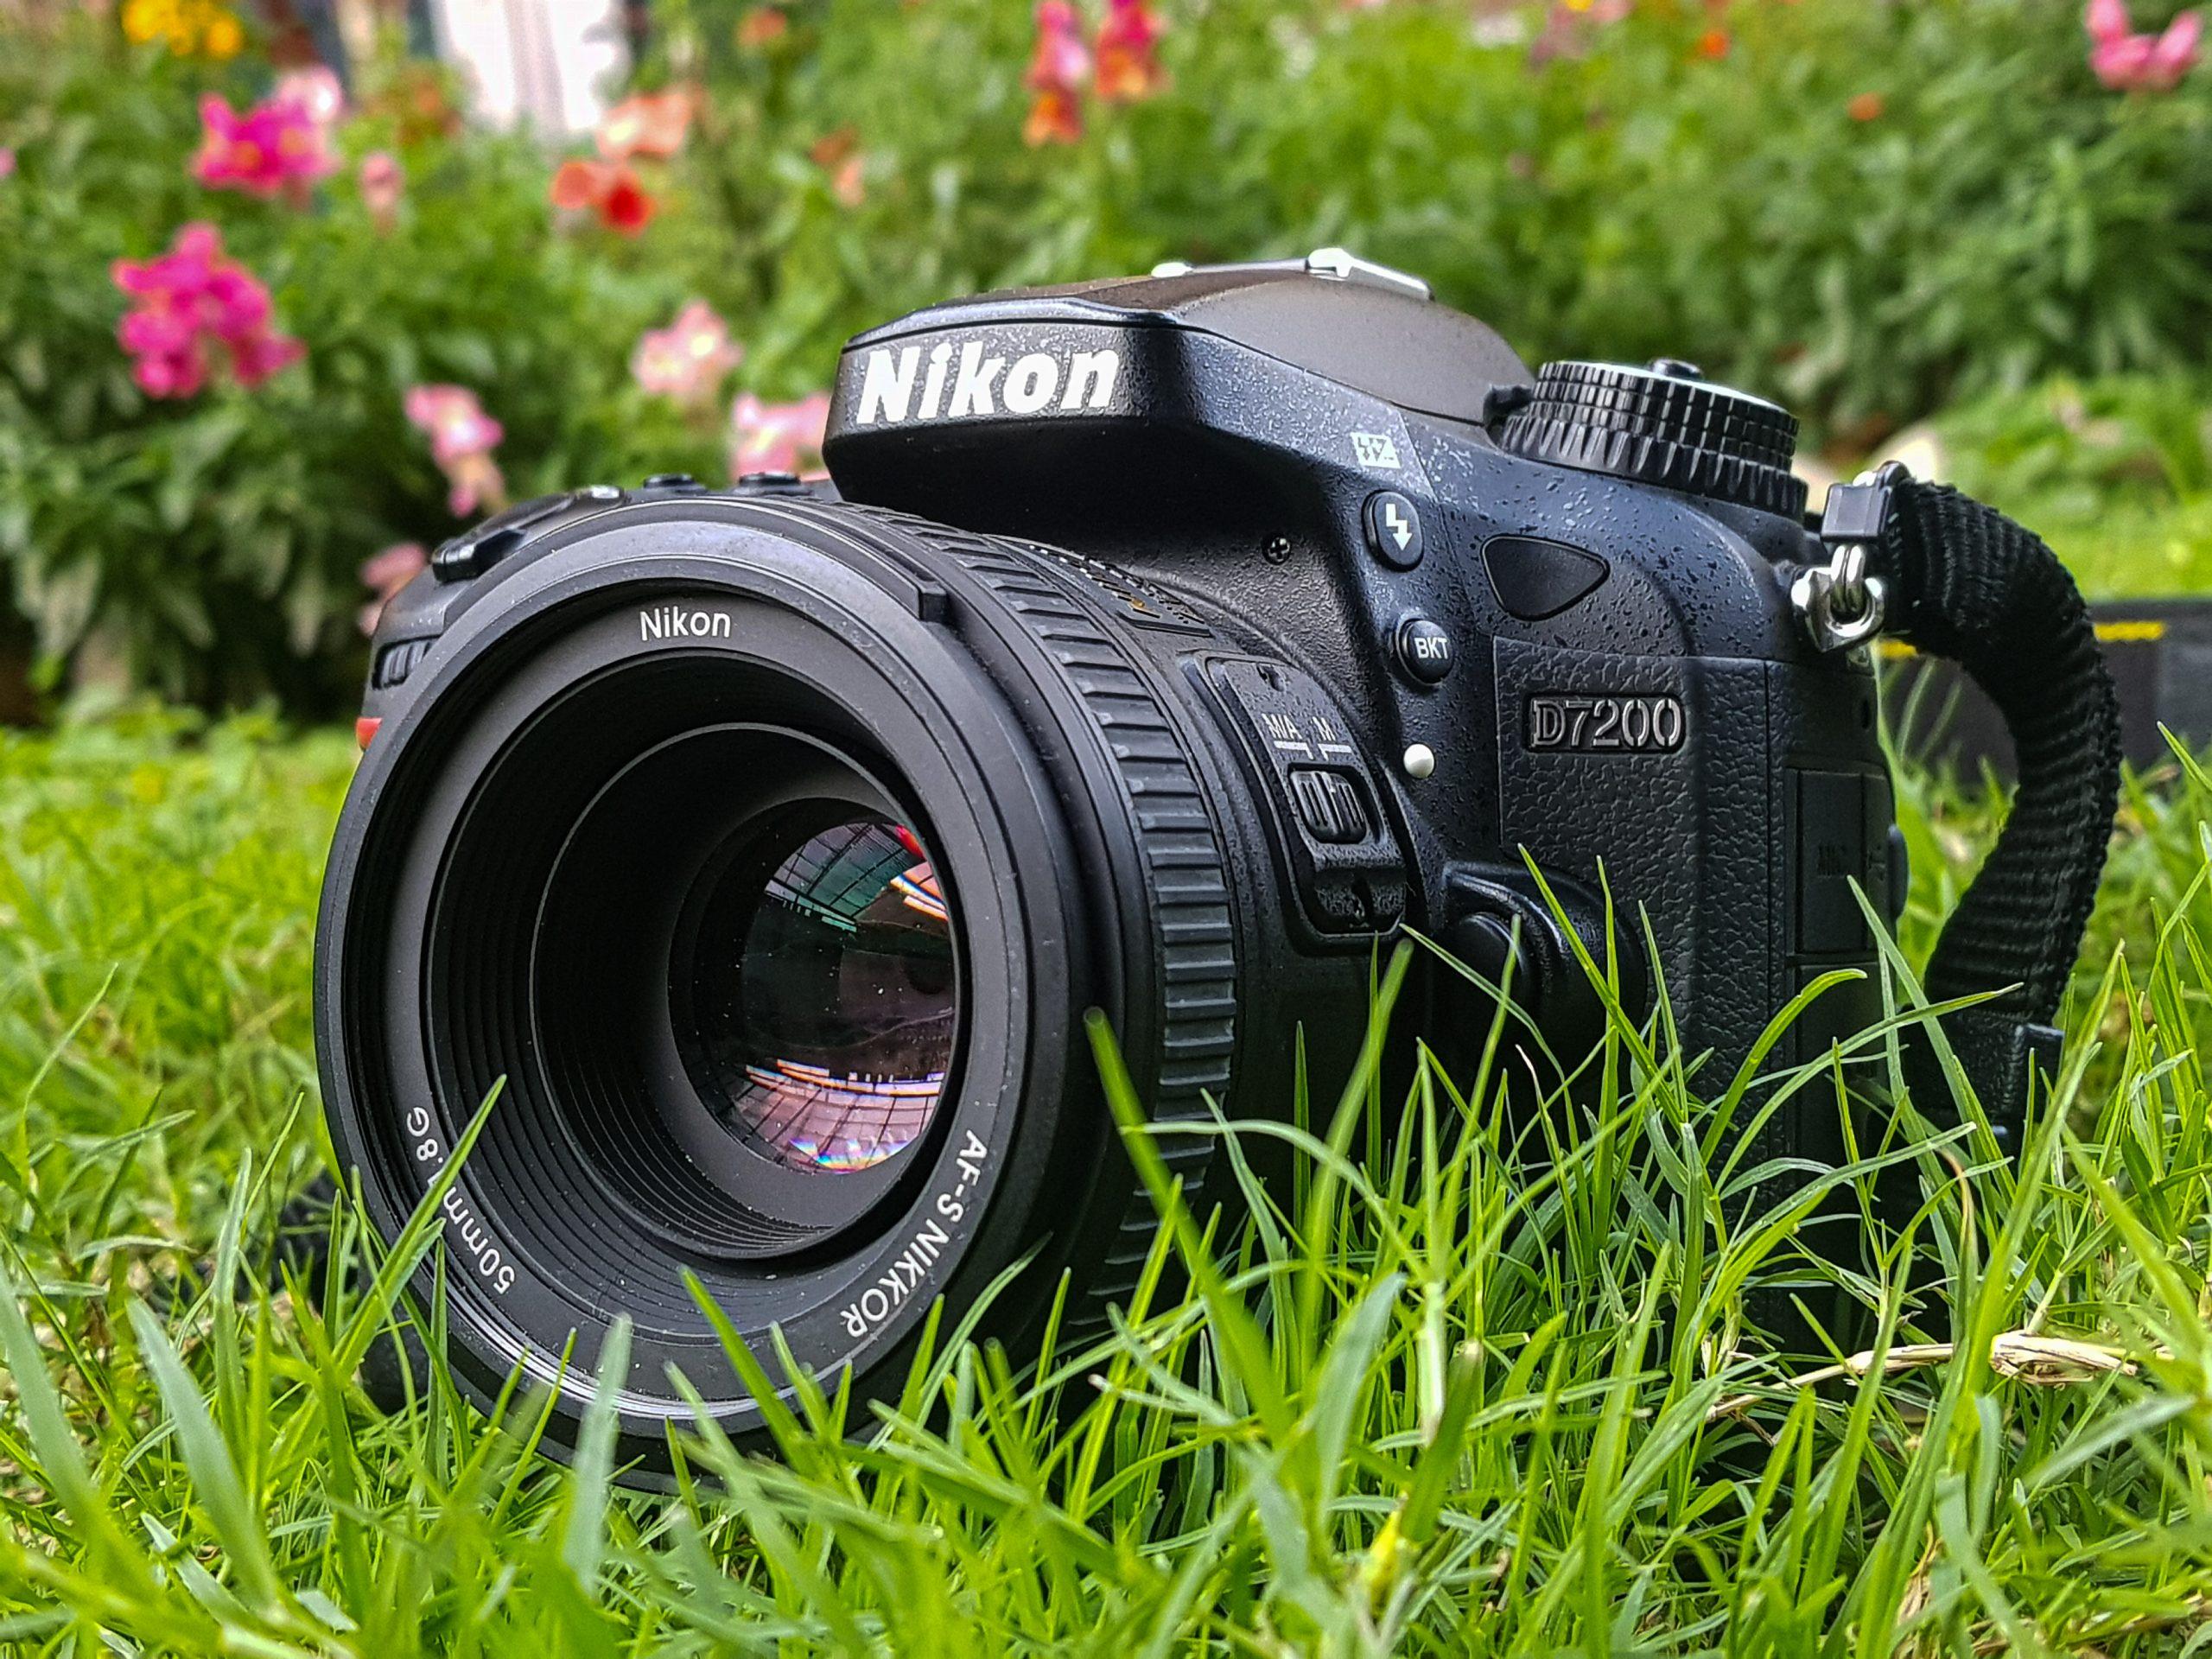 Nikon Camera laid on grass